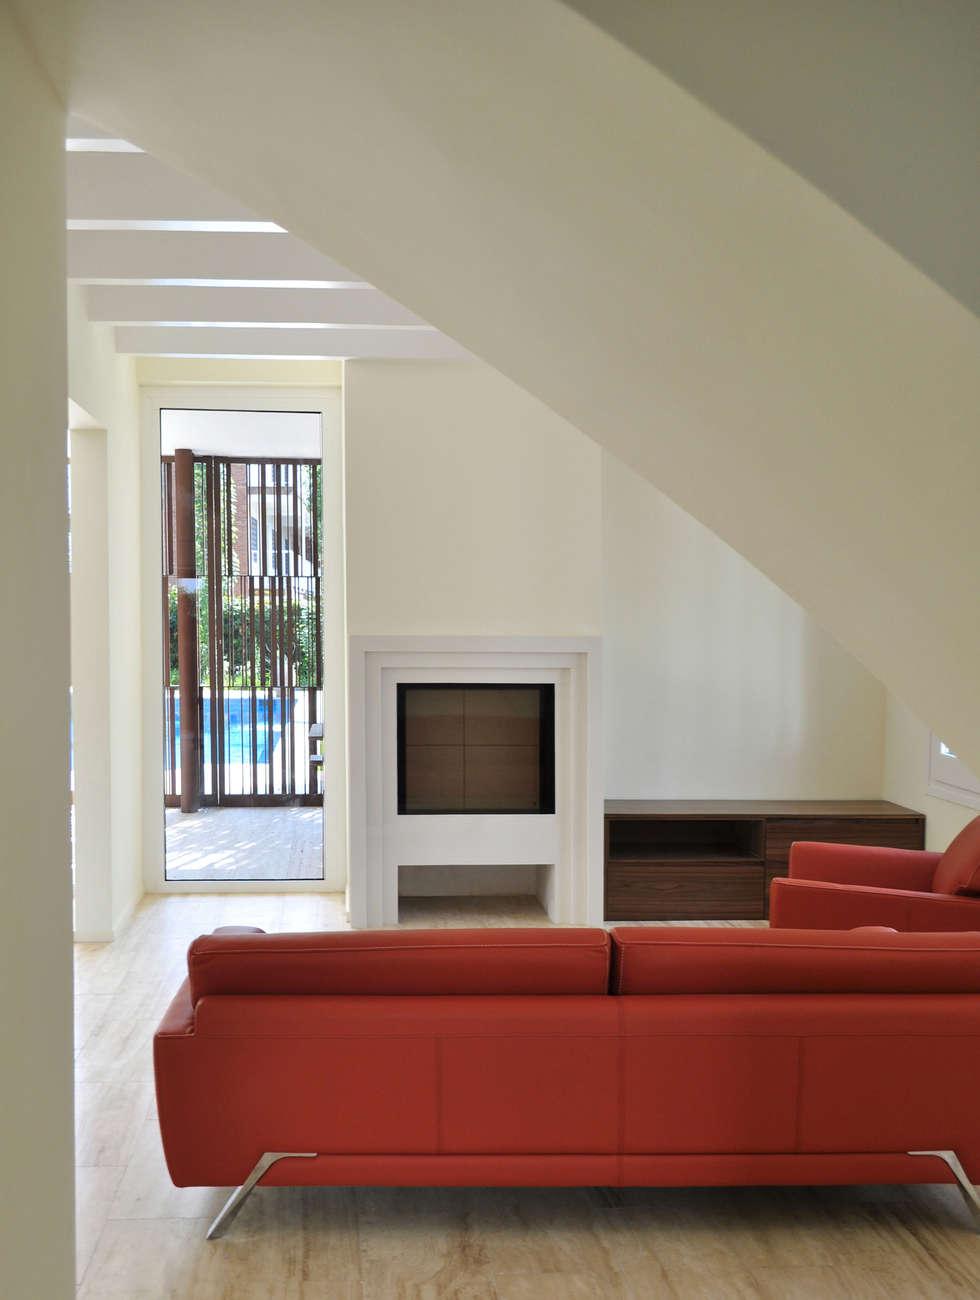 Fotos de decora o design de interiores e remodela es homify - Arquitecto sitges ...